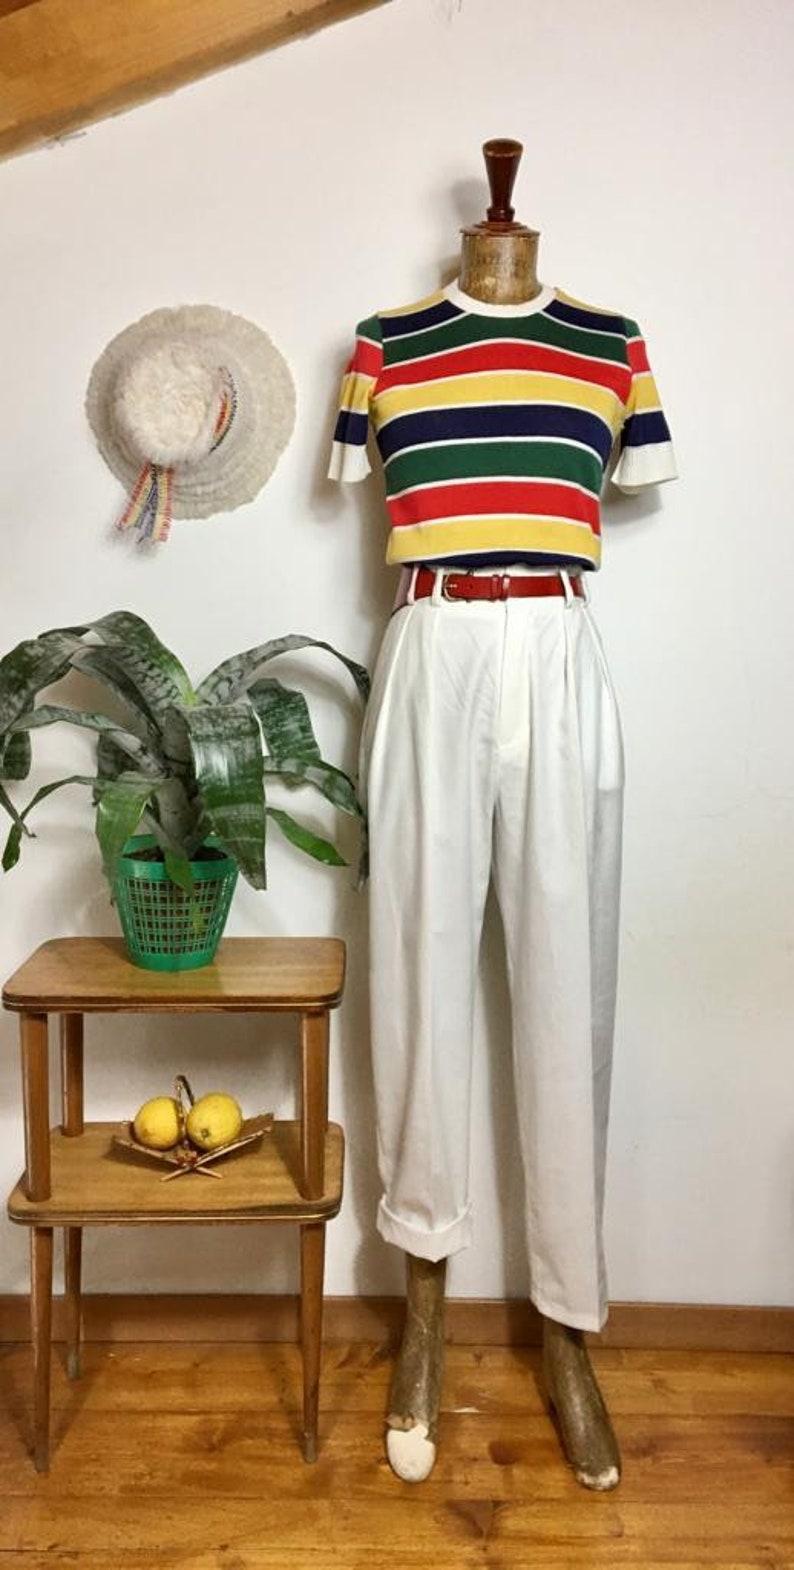 "1950s Men's Pants, Trousers, Shorts | Rockabilly Jeans, Greaser Styles Vintage 1950s Style White Cotton Gabardine ""Liz"" Trousers Pants - size SMLXL $114.87 AT vintagedancer.com"